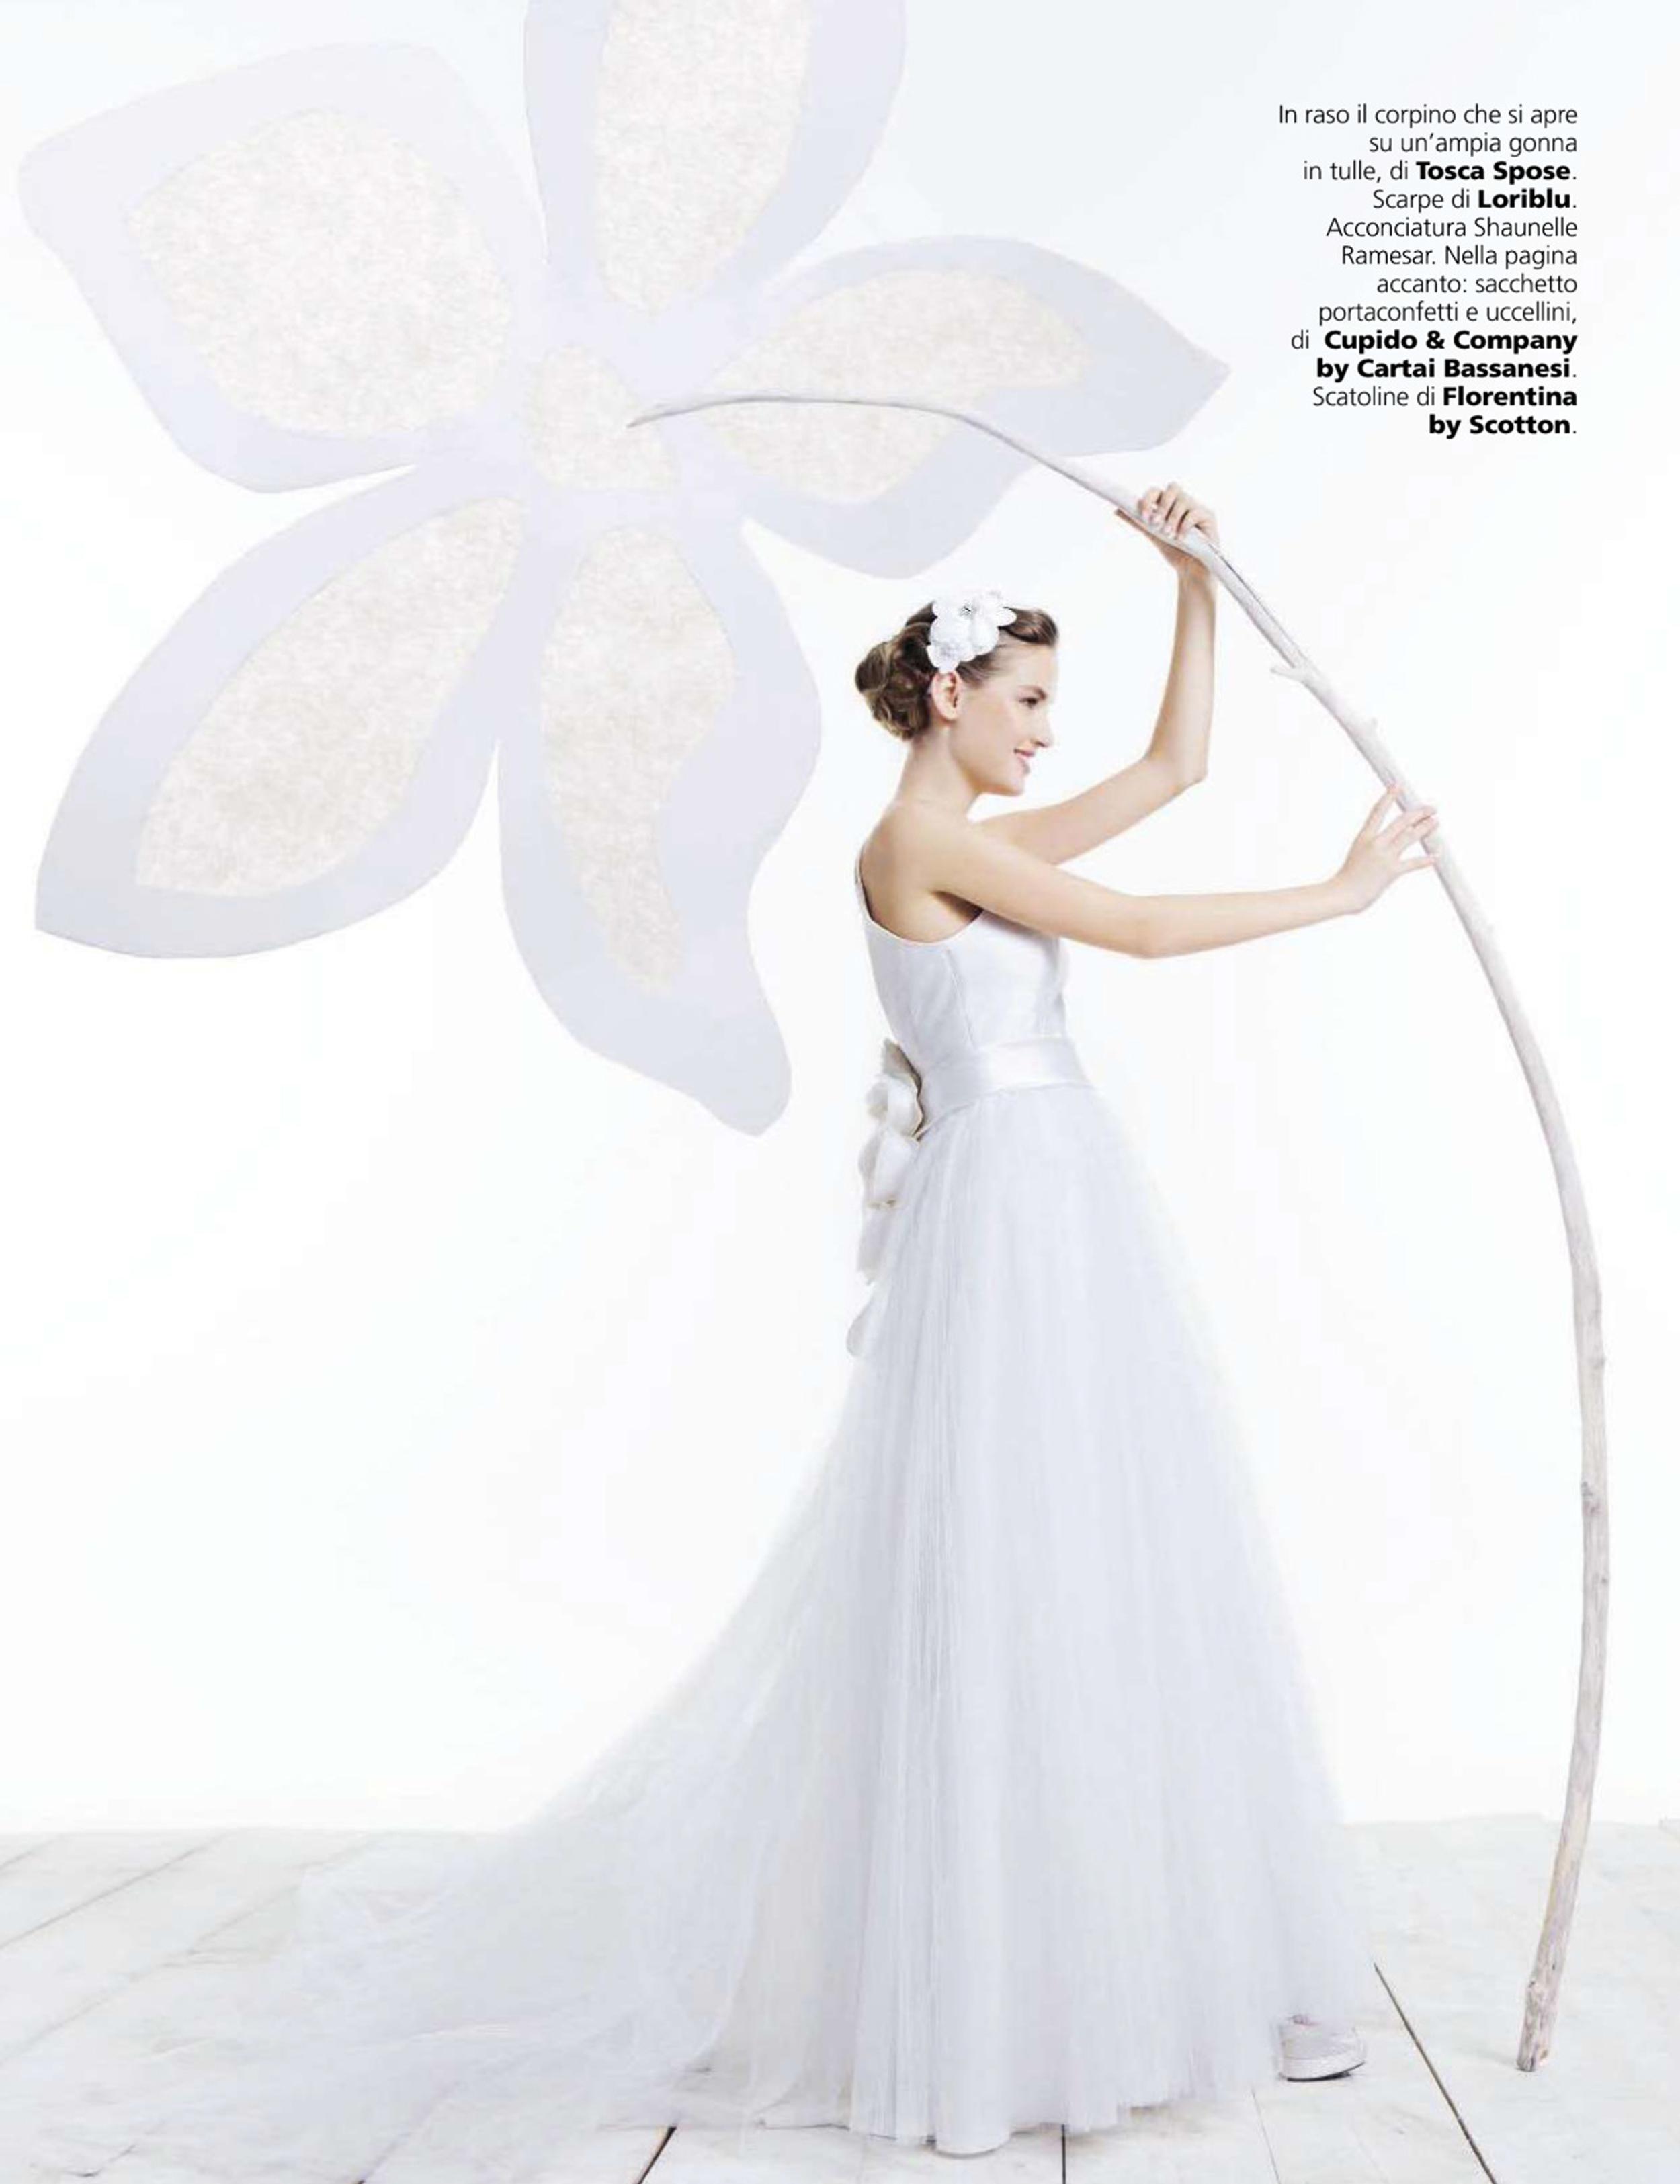 Vogue Spoa Italian Gennaio 2015 Shaunelle Ramesar Fiori Headpiece ©2015.jpg